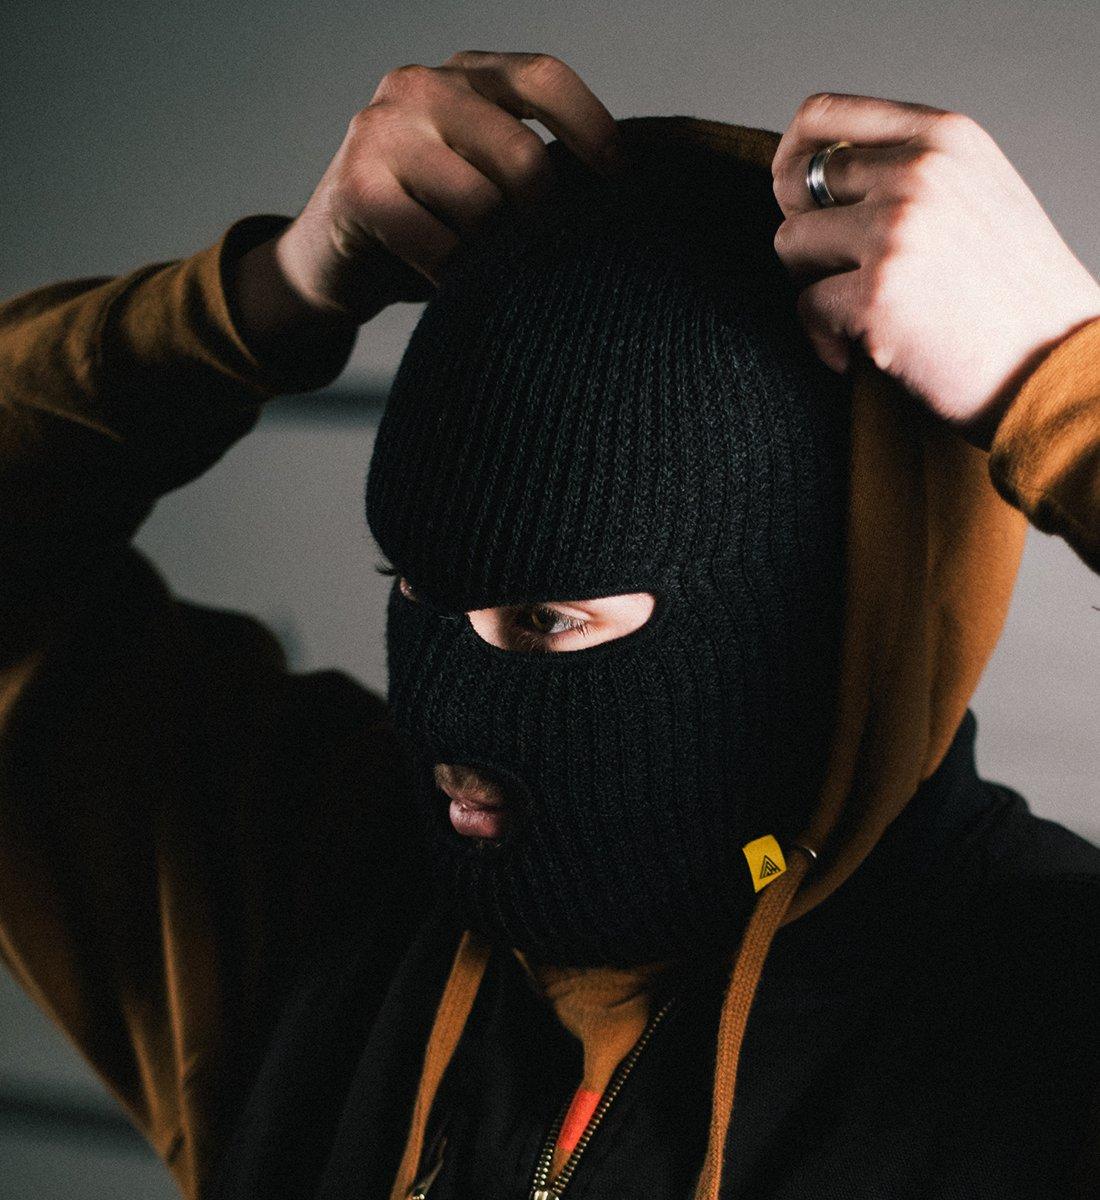 reeves-facemask-life-2_2000x.jpg